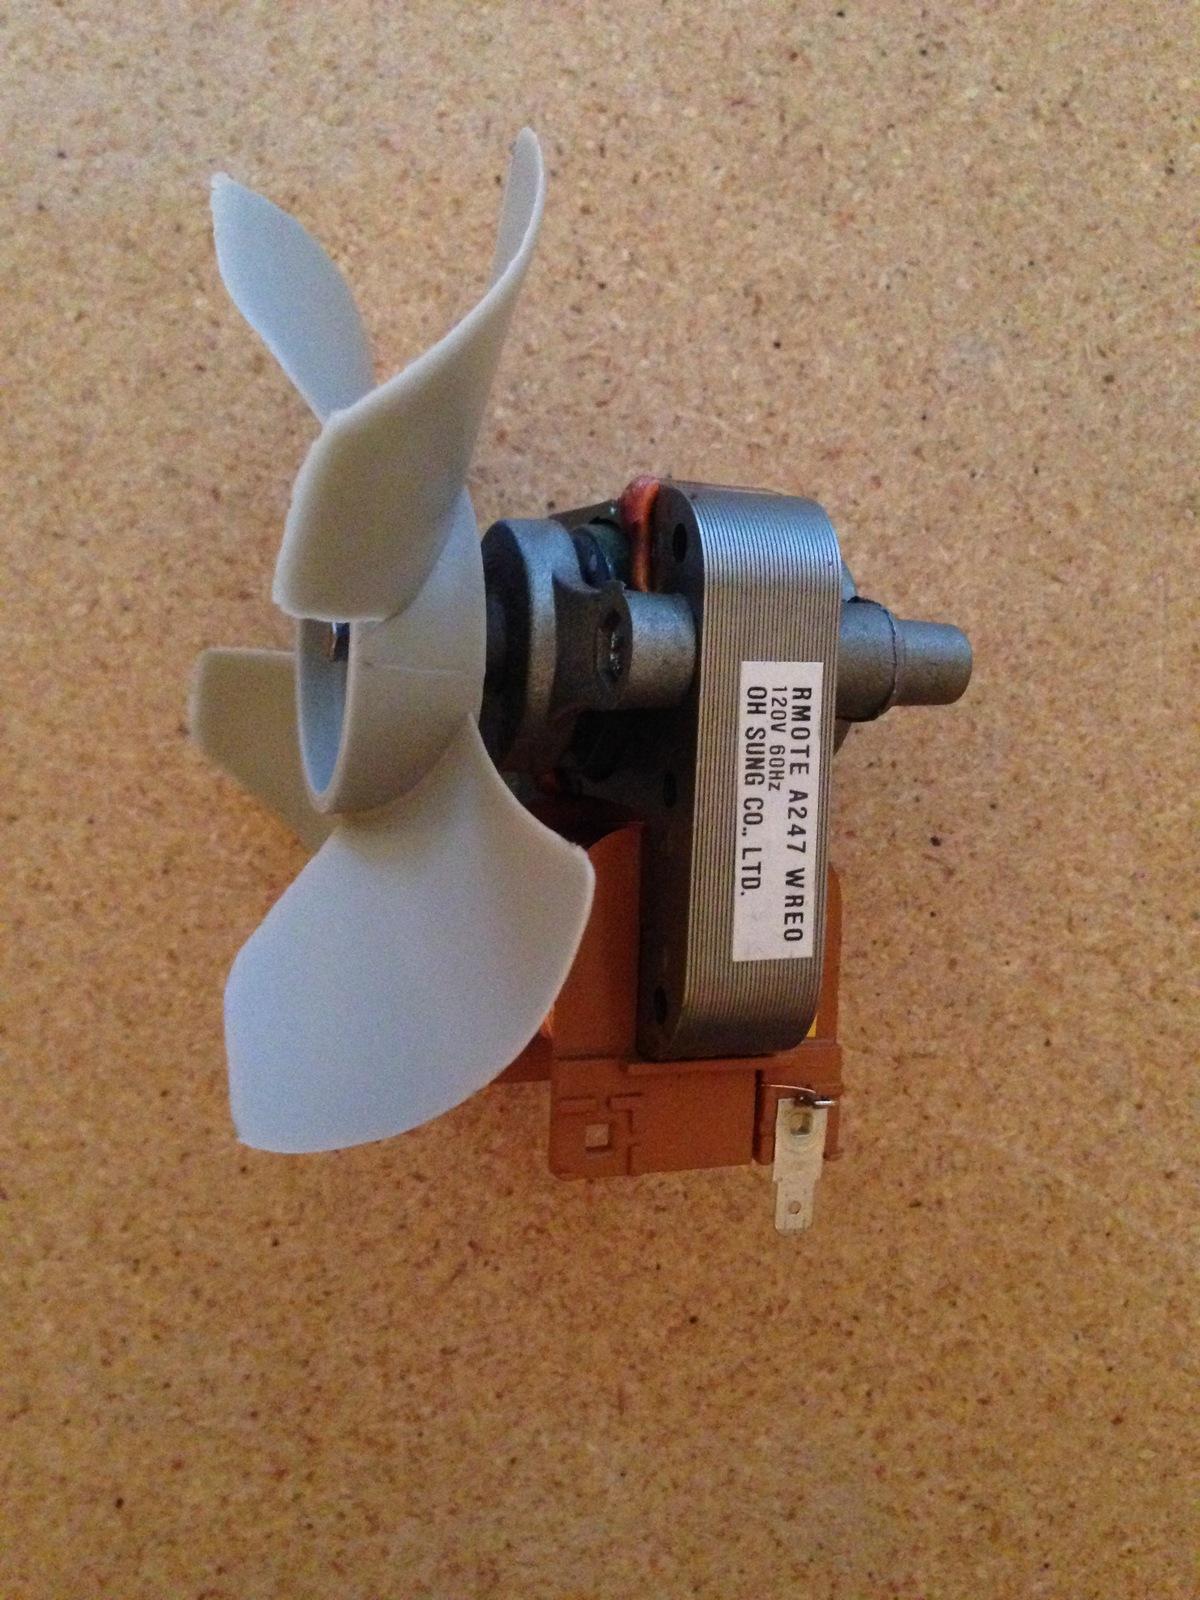 Sharp Microwave Oven OEM Fan Motor Assembly RMOTEA247WRE0 - $24.00